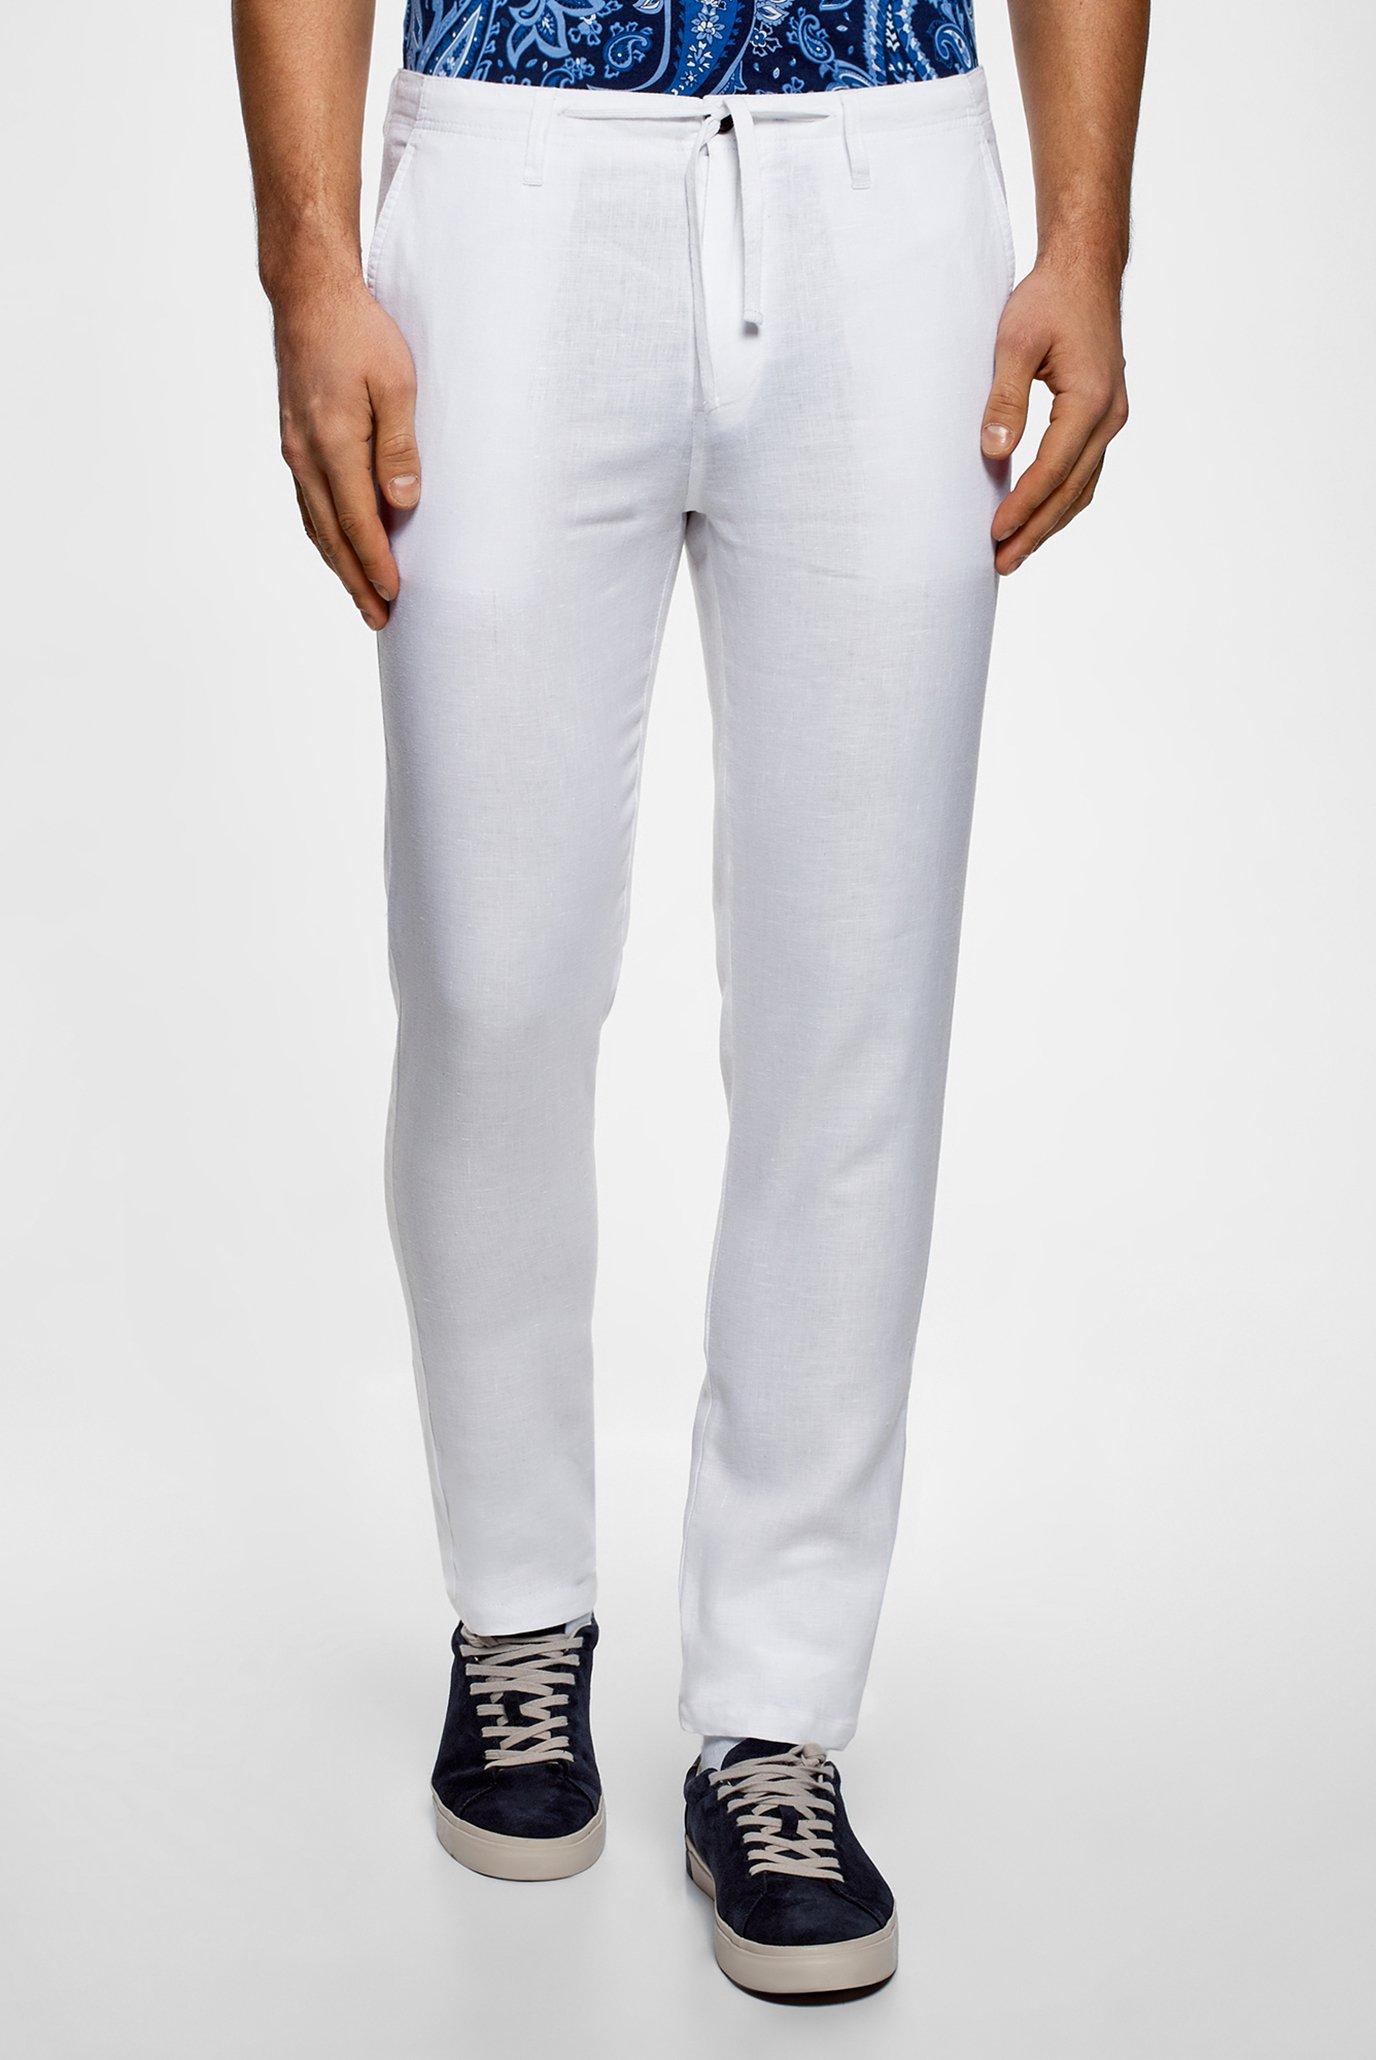 effd4c14538ef25 Купить Мужские белые брюки Oodji Oodji 2B200018M/44233N/1000N – Киев,  Украина. Цены в интернет магазине MD Fashion